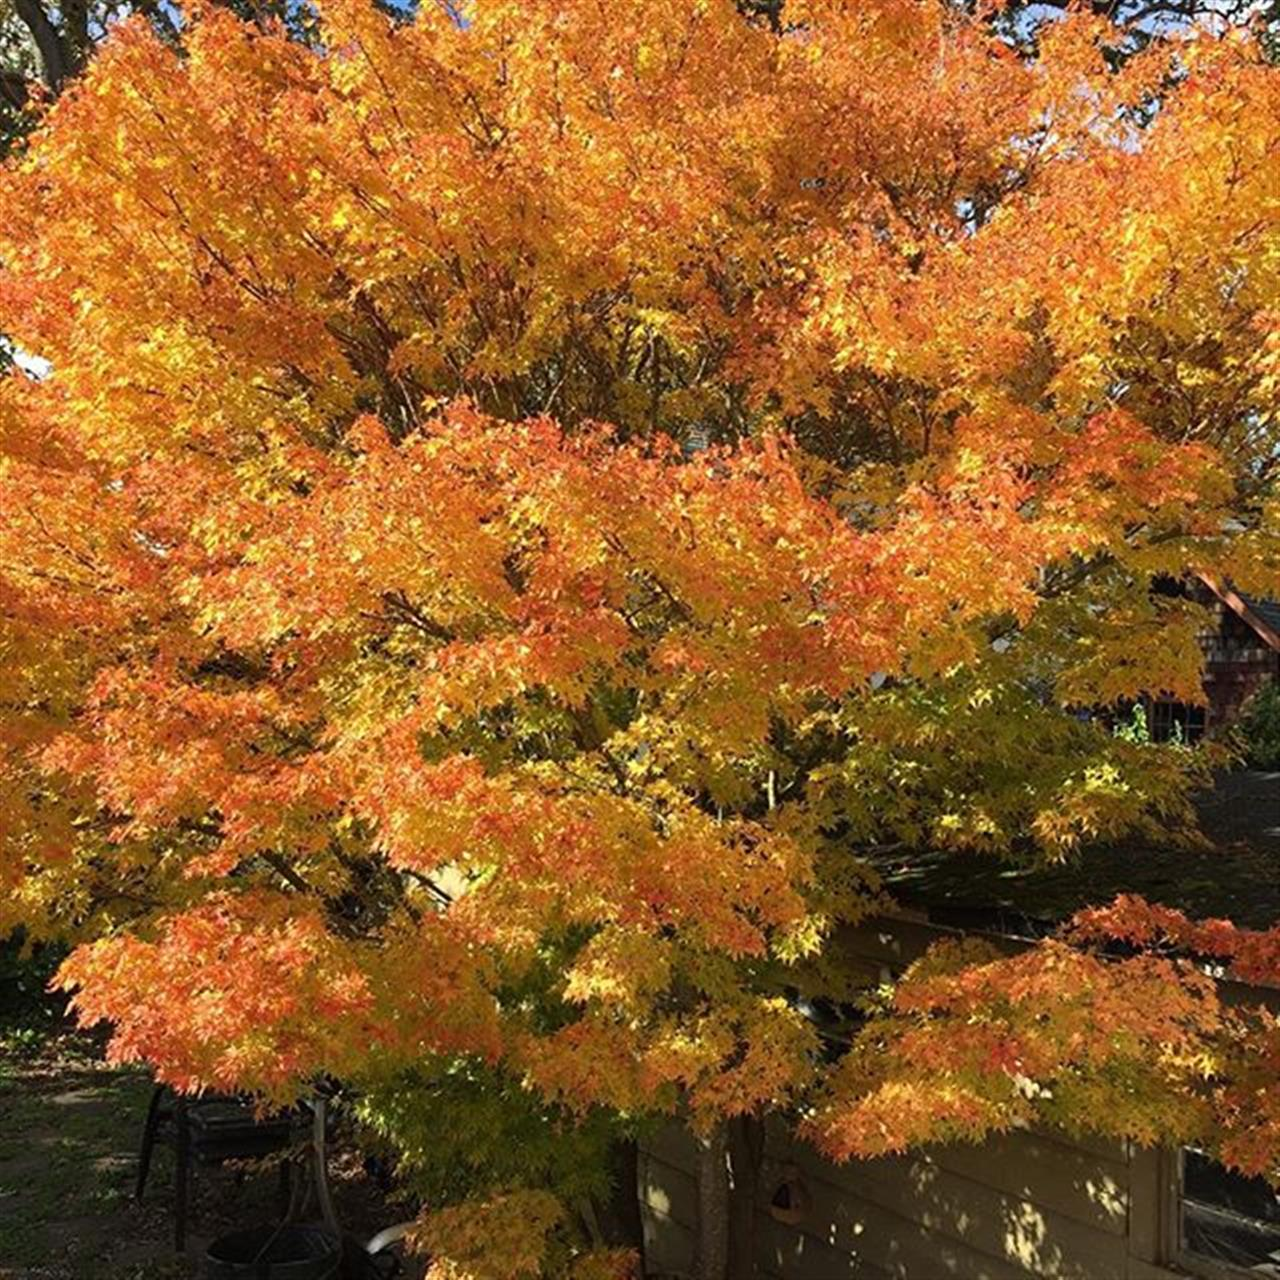 #nofilter #fall #oakbay #japanesemaple #leadingrelocal #realtorlife #realestate #realestateagent